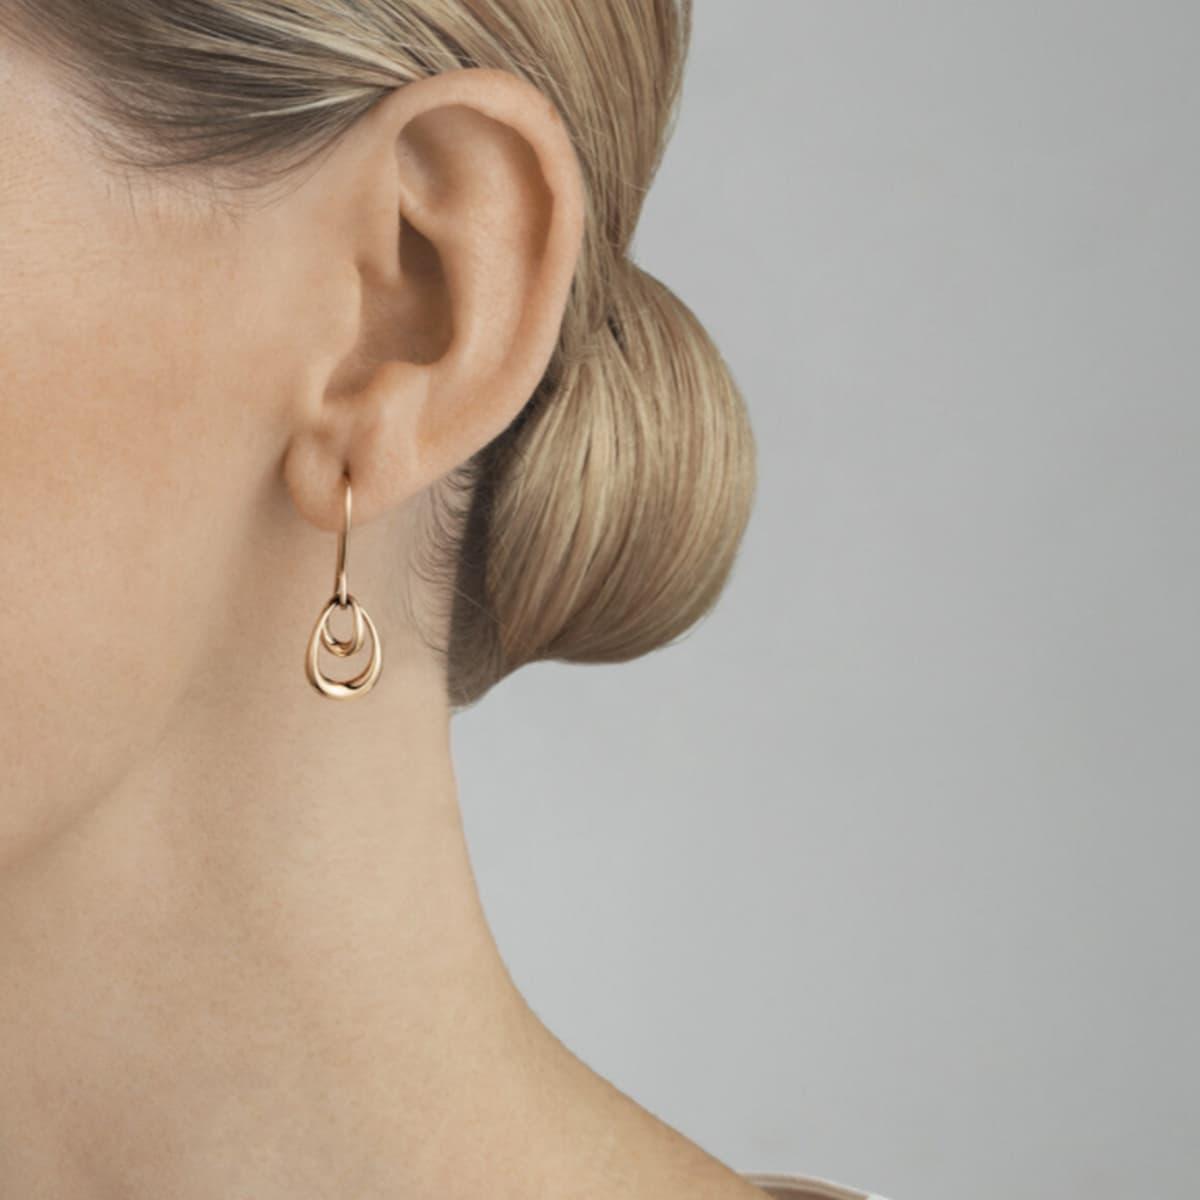 Georg Jensen Offspring Earrings